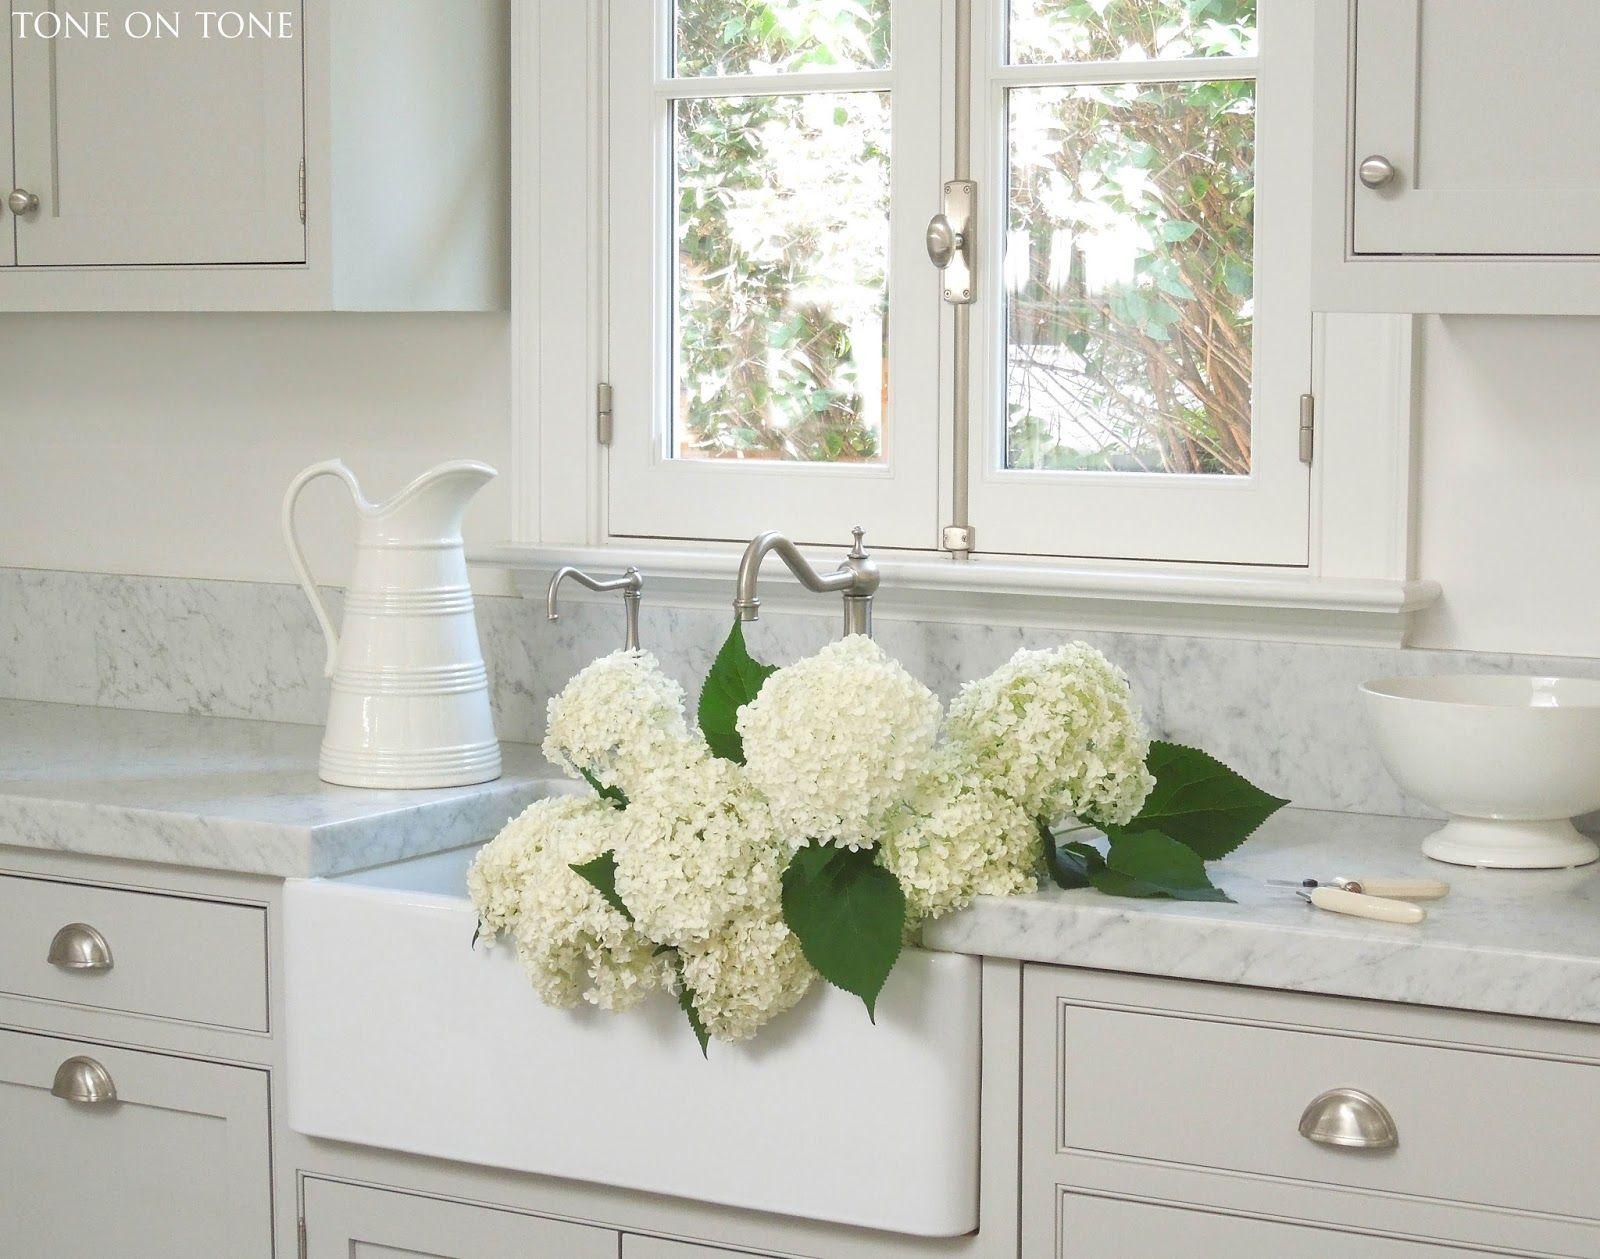 Tone on Tone. Our kitchen with gray Carrara